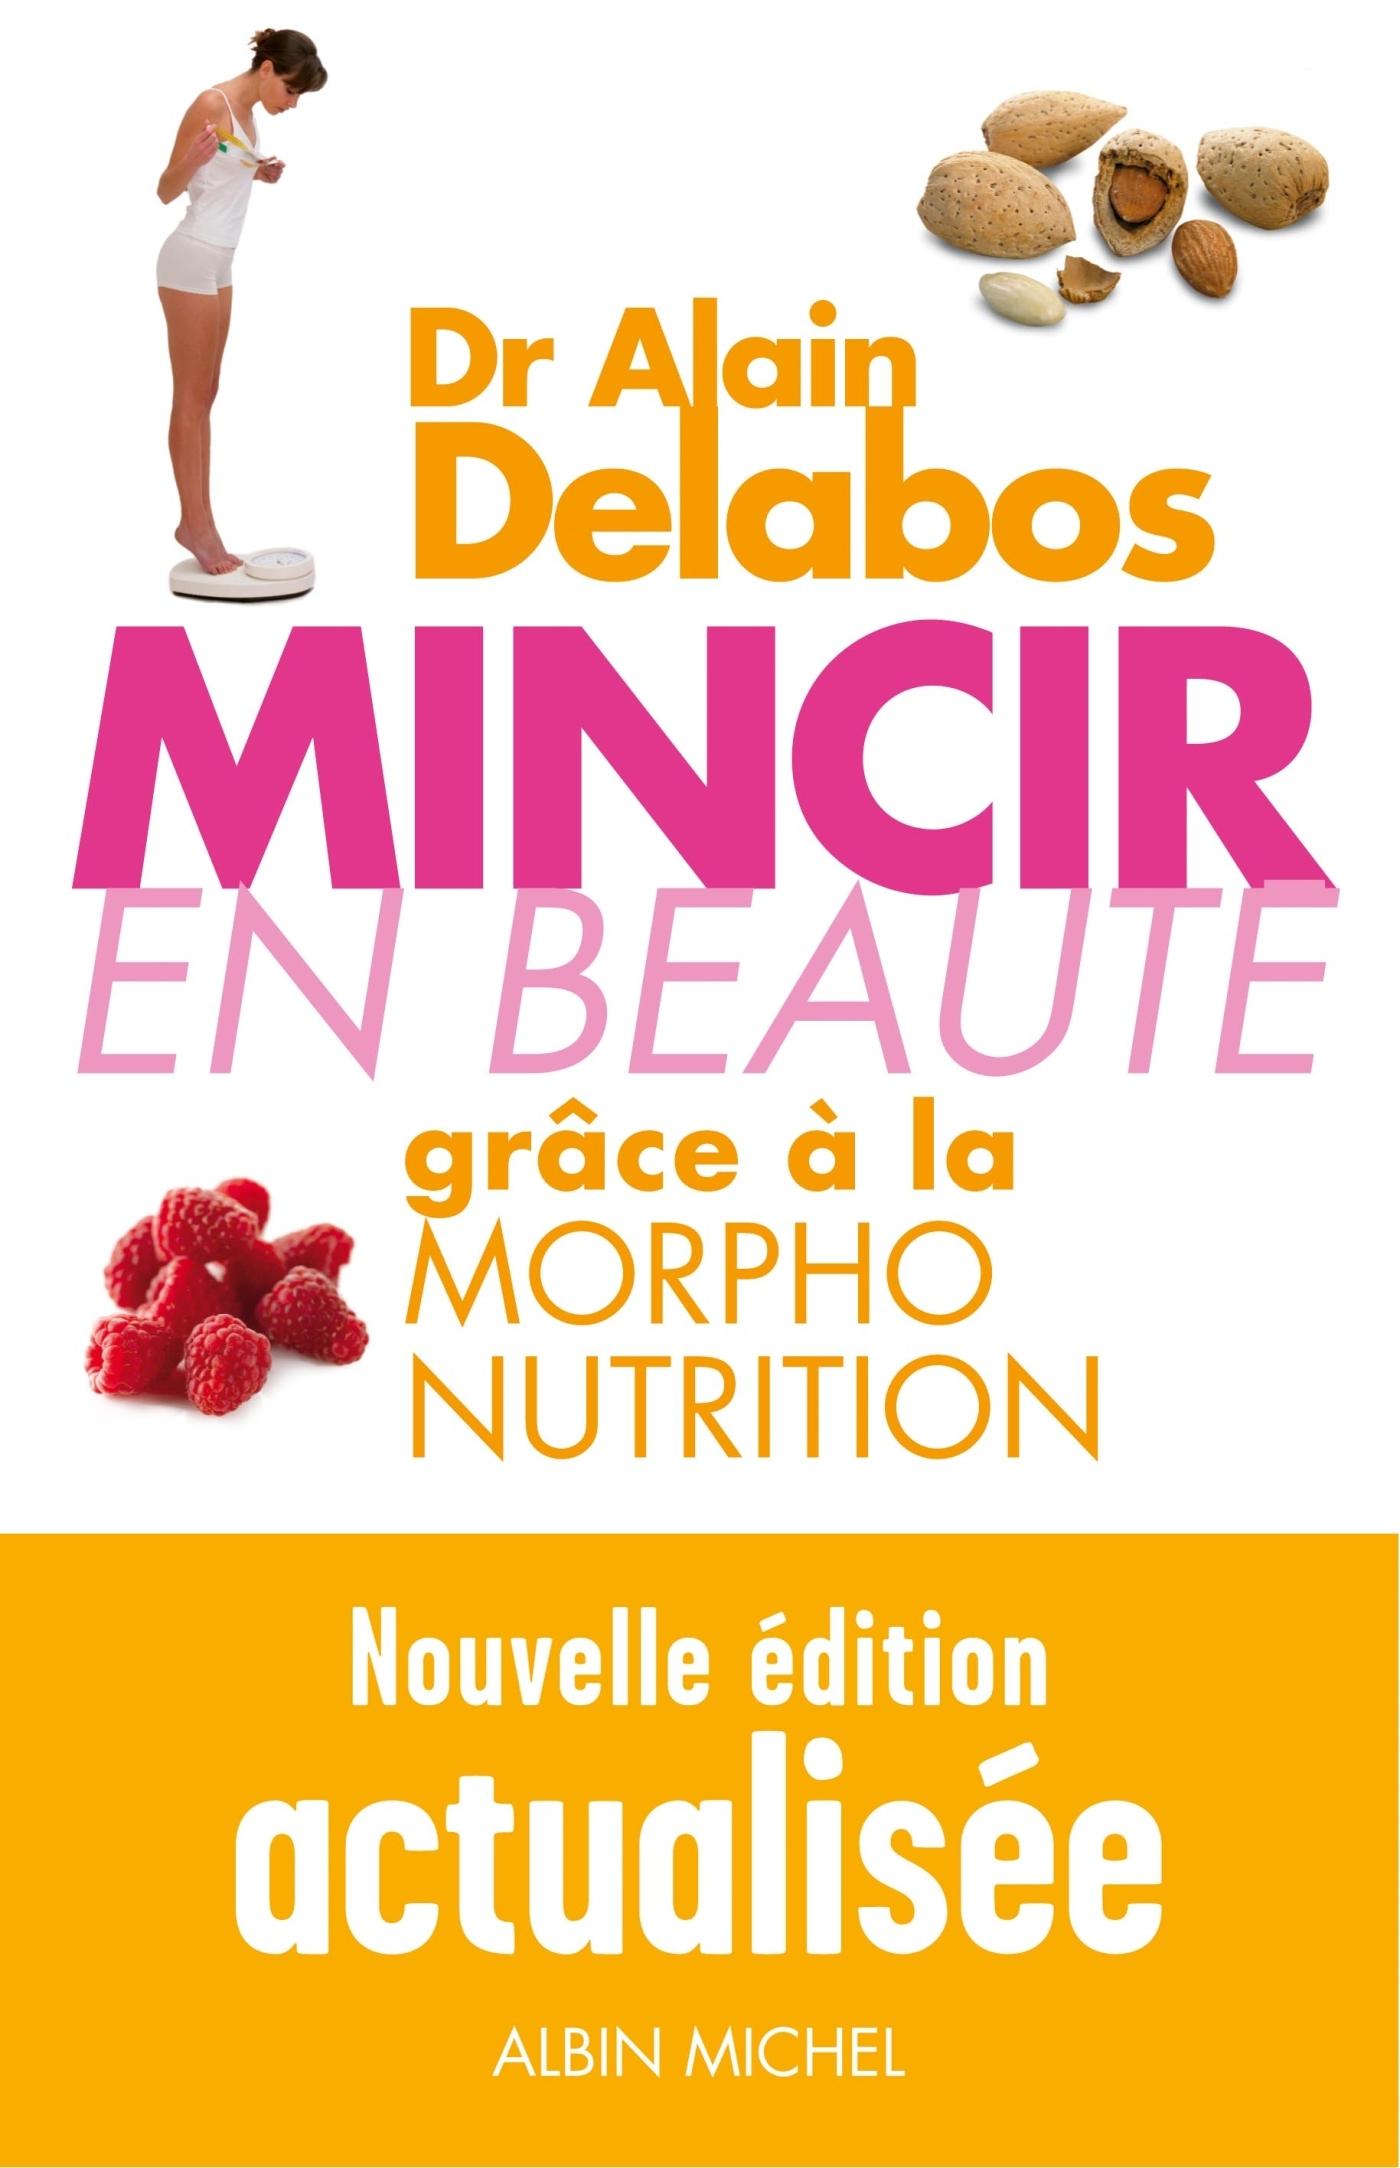 MINCIR EN BEAUTE GRACE A LA MORPHO-NUTRITION